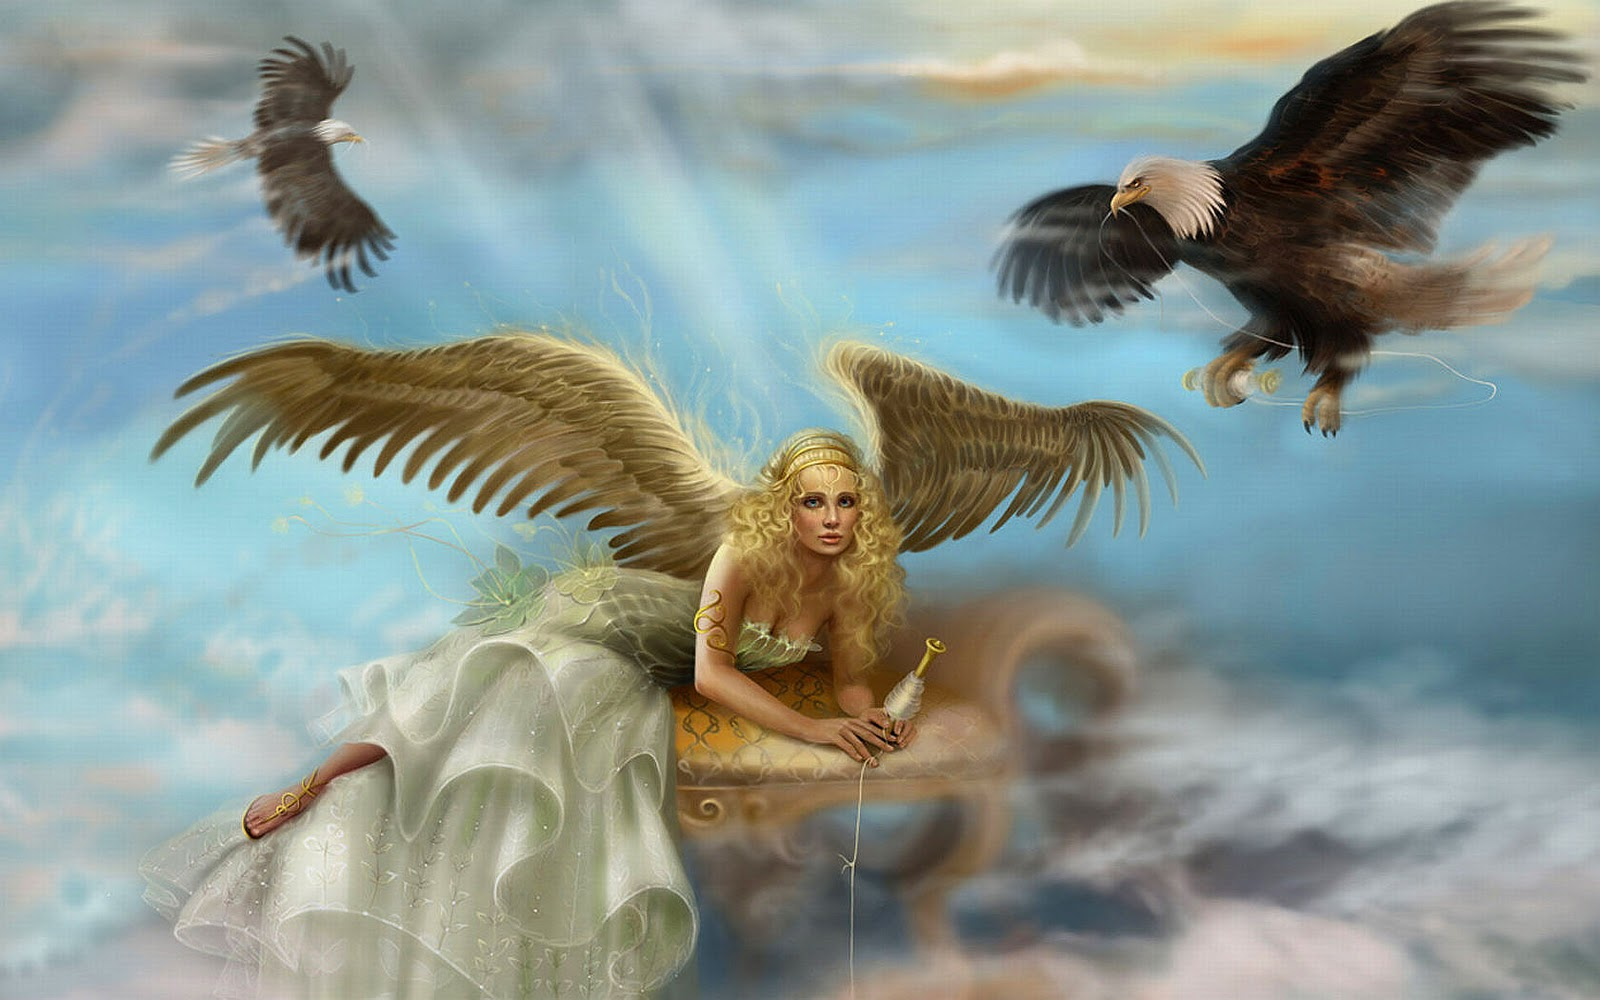 Best Desktop HD Wallpapers: Angel Photo